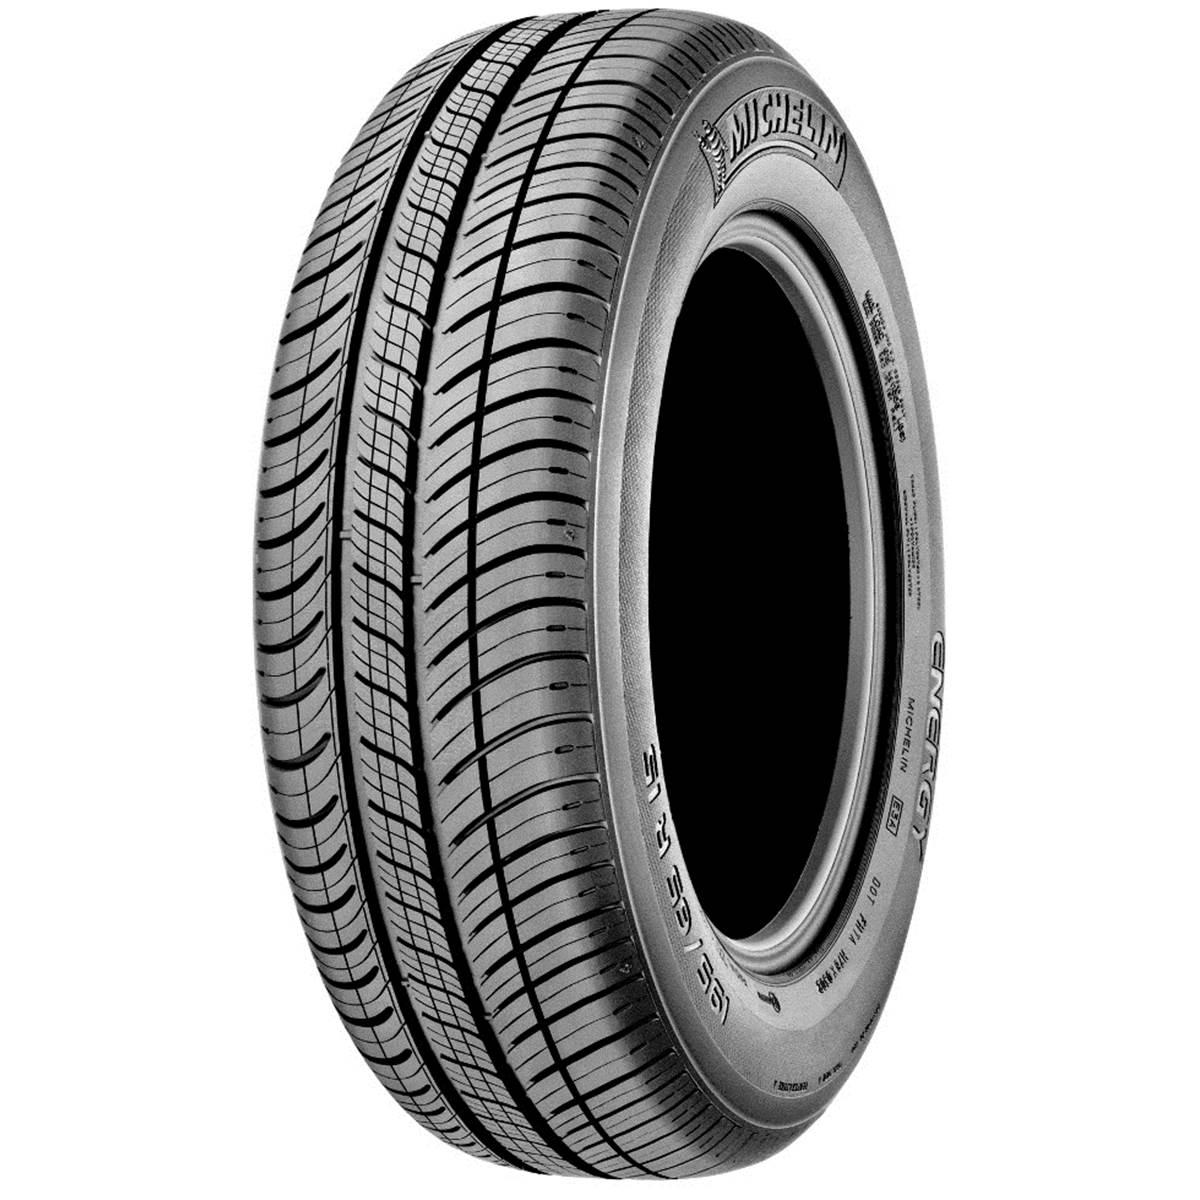 Pneu Michelin 175/60R14 79T Energy E3A